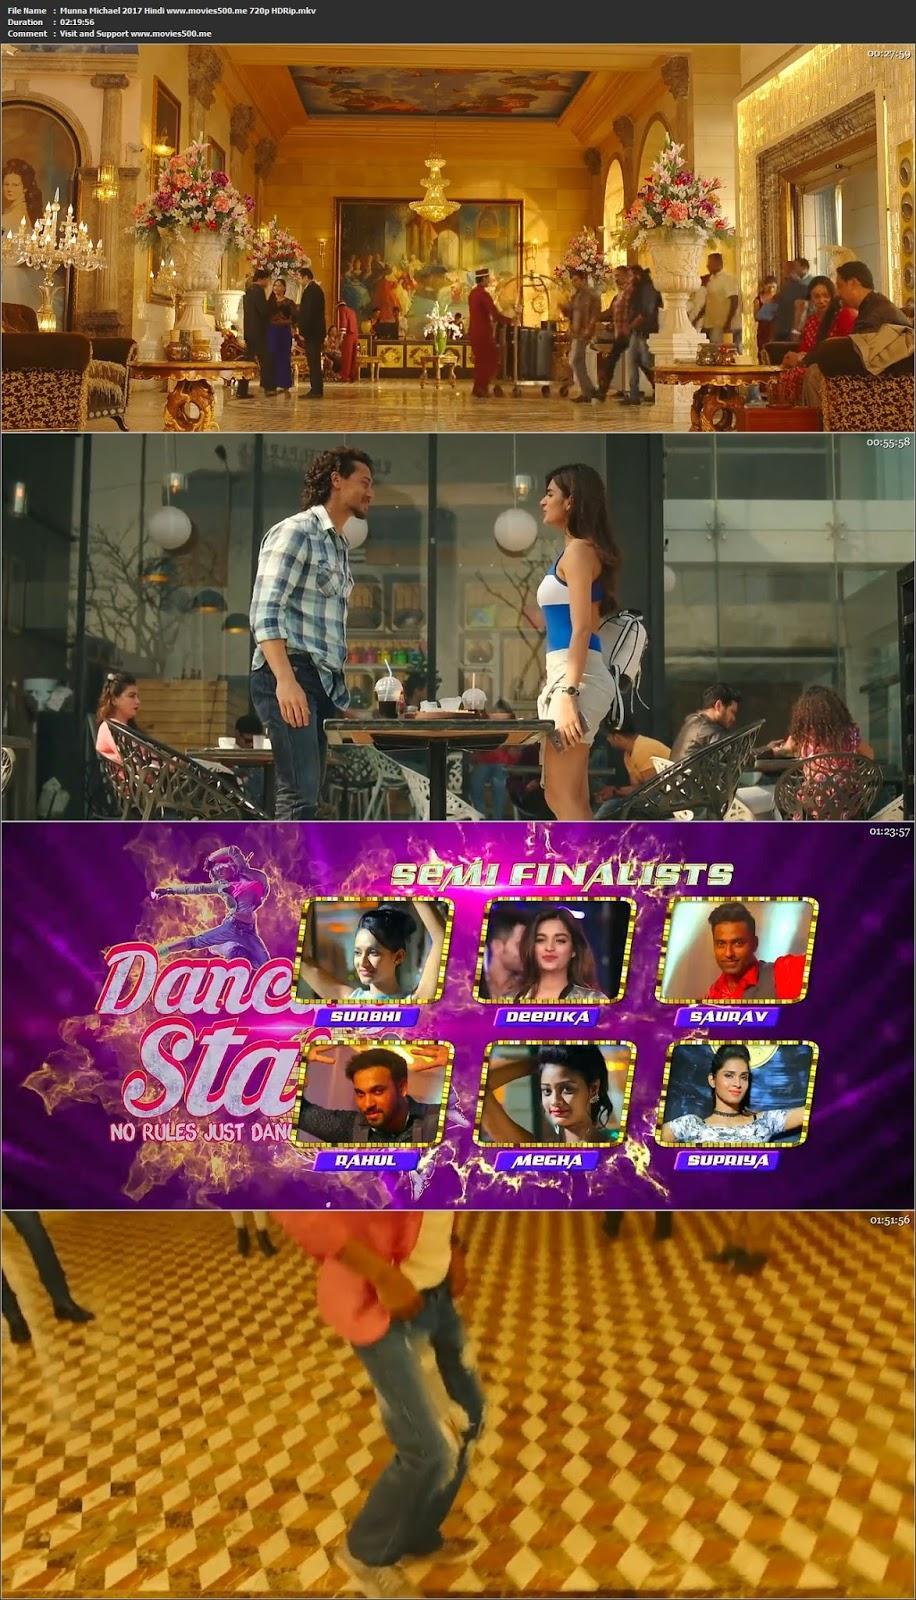 Munna Michael 2017 Hindi Movie HDRip 720p 1GB at softwaresonly.com